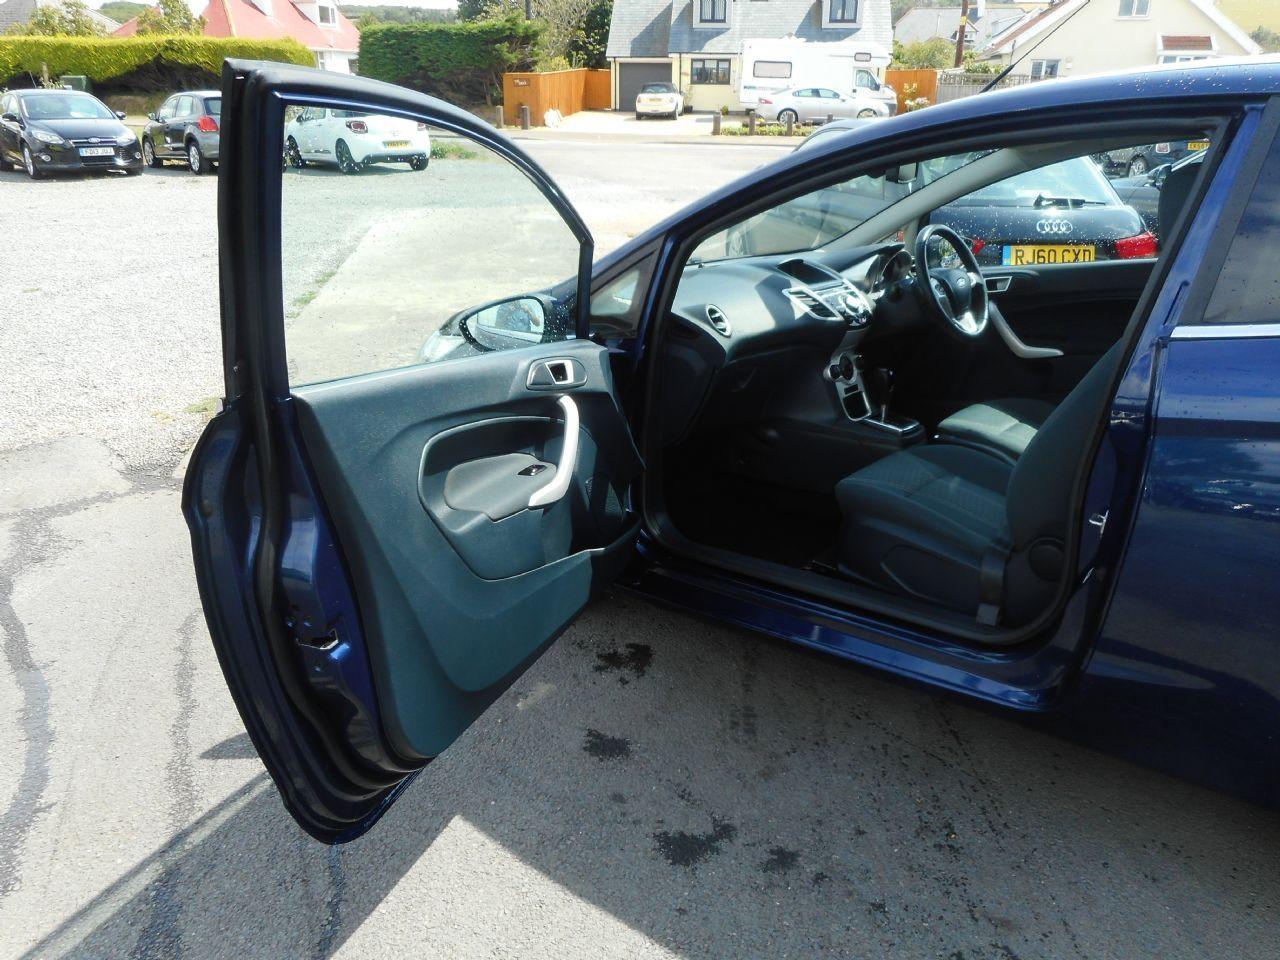 FORD Fiesta Titanium 1.4 096 Auto (2012) - Picture 10